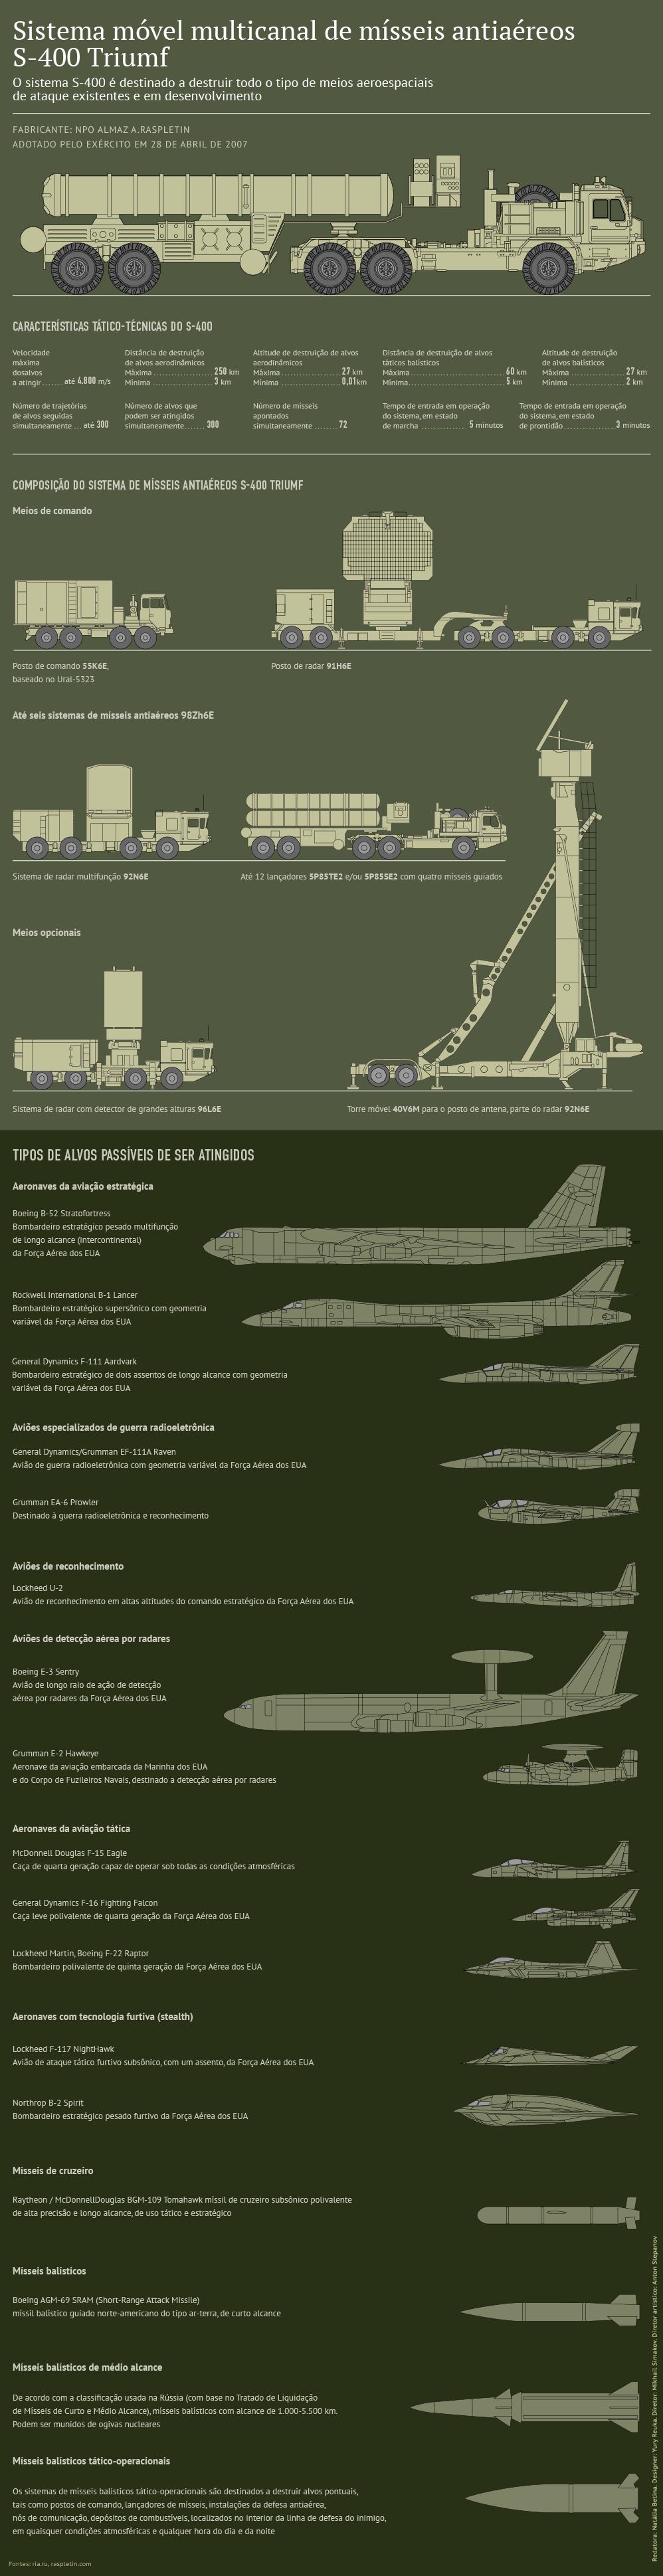 Sistema móvel multicanal de mísseis antiaéreos S-400 Triumf